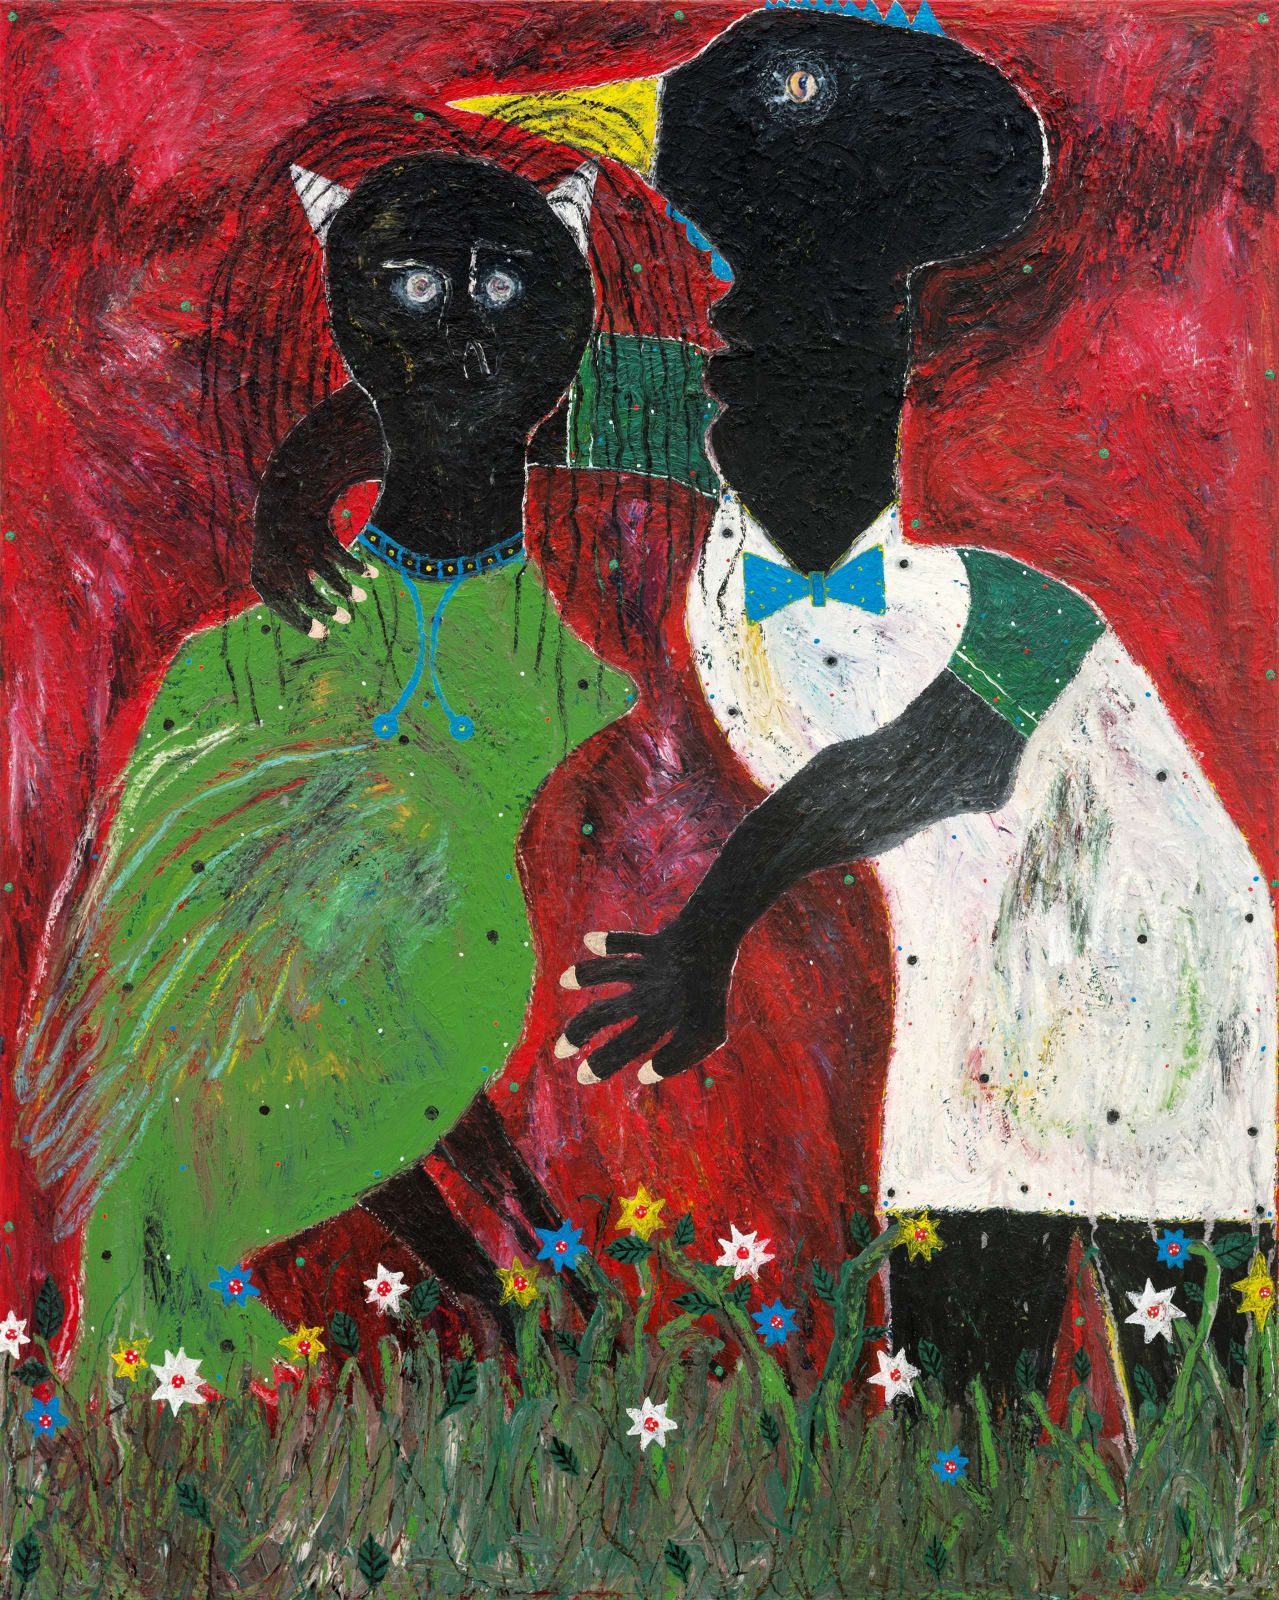 Adjani Okpu-Egbe After the Proposa, 2018